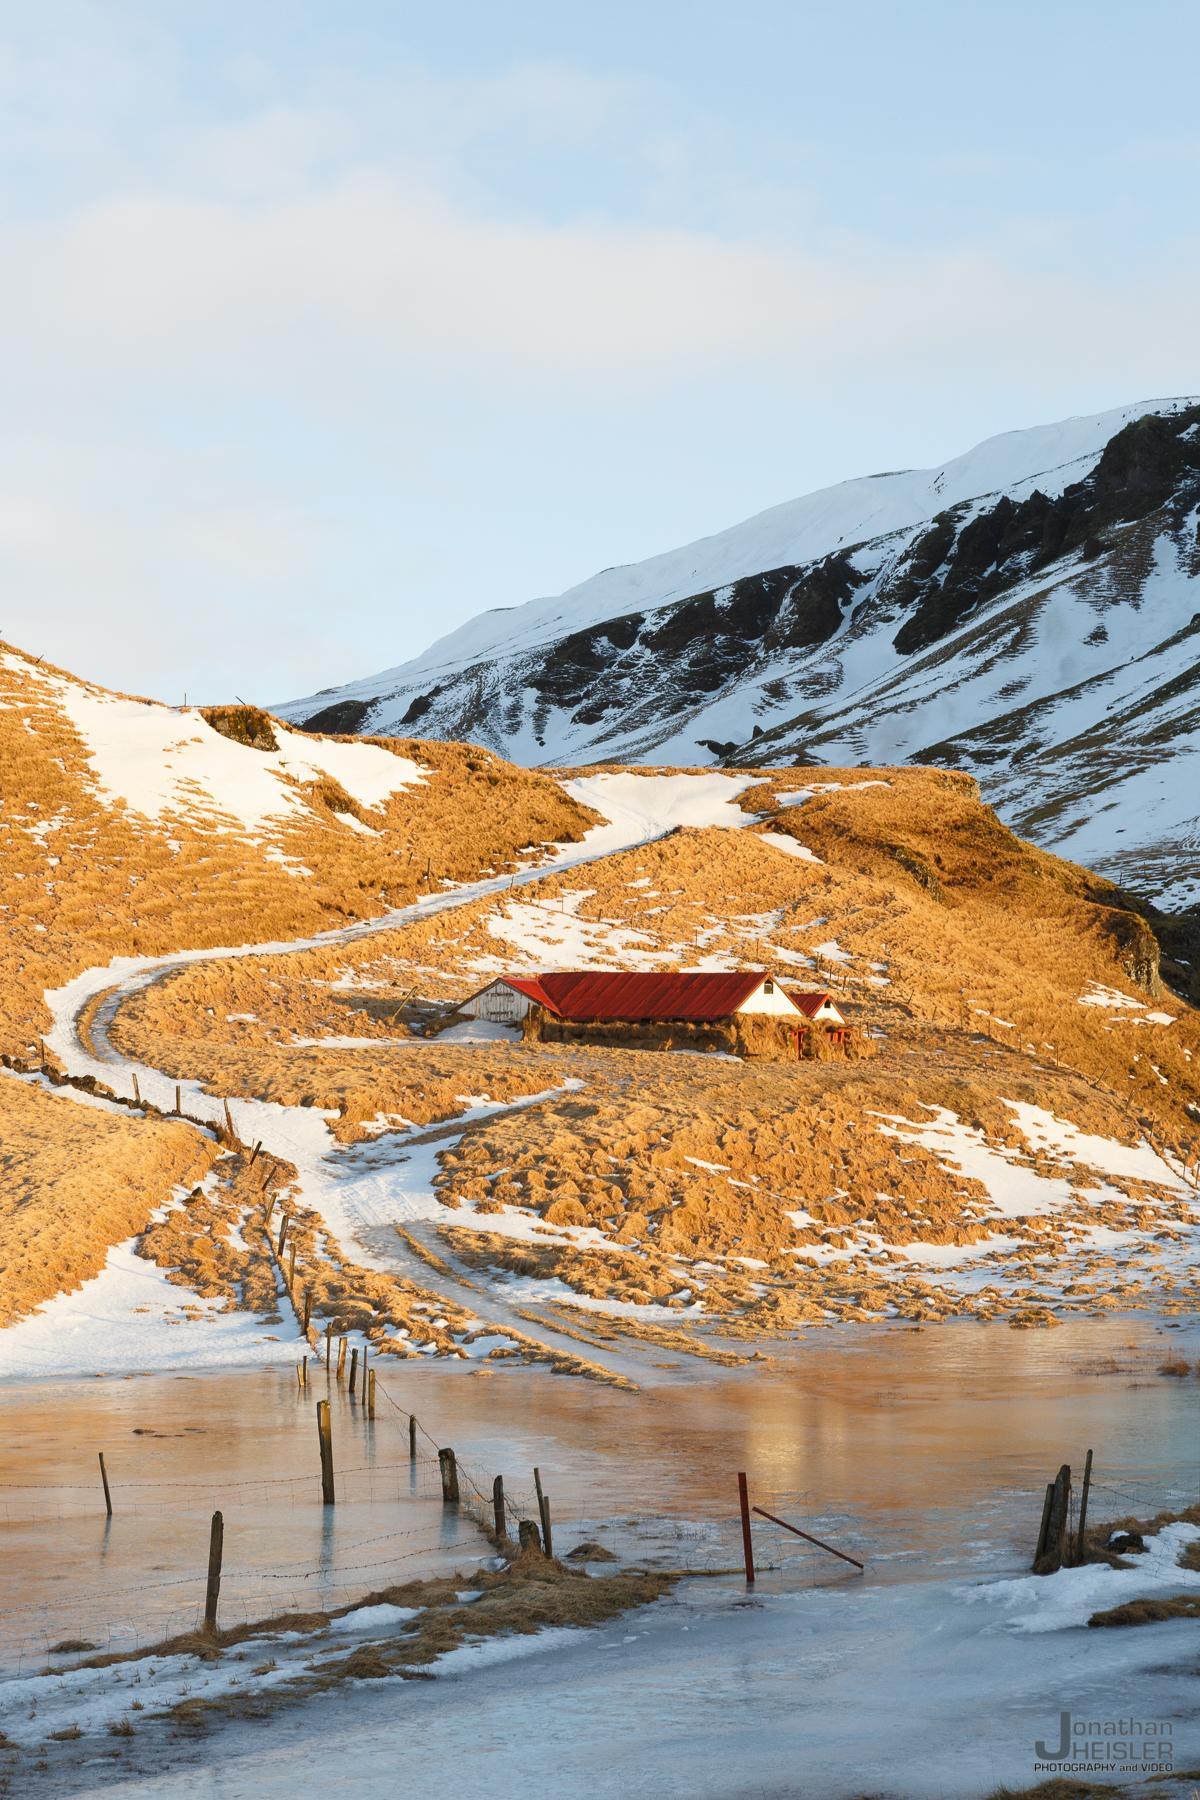 Iceland Winter Photos_  Jonathan Heisler __  02292016 _ 008.jpg